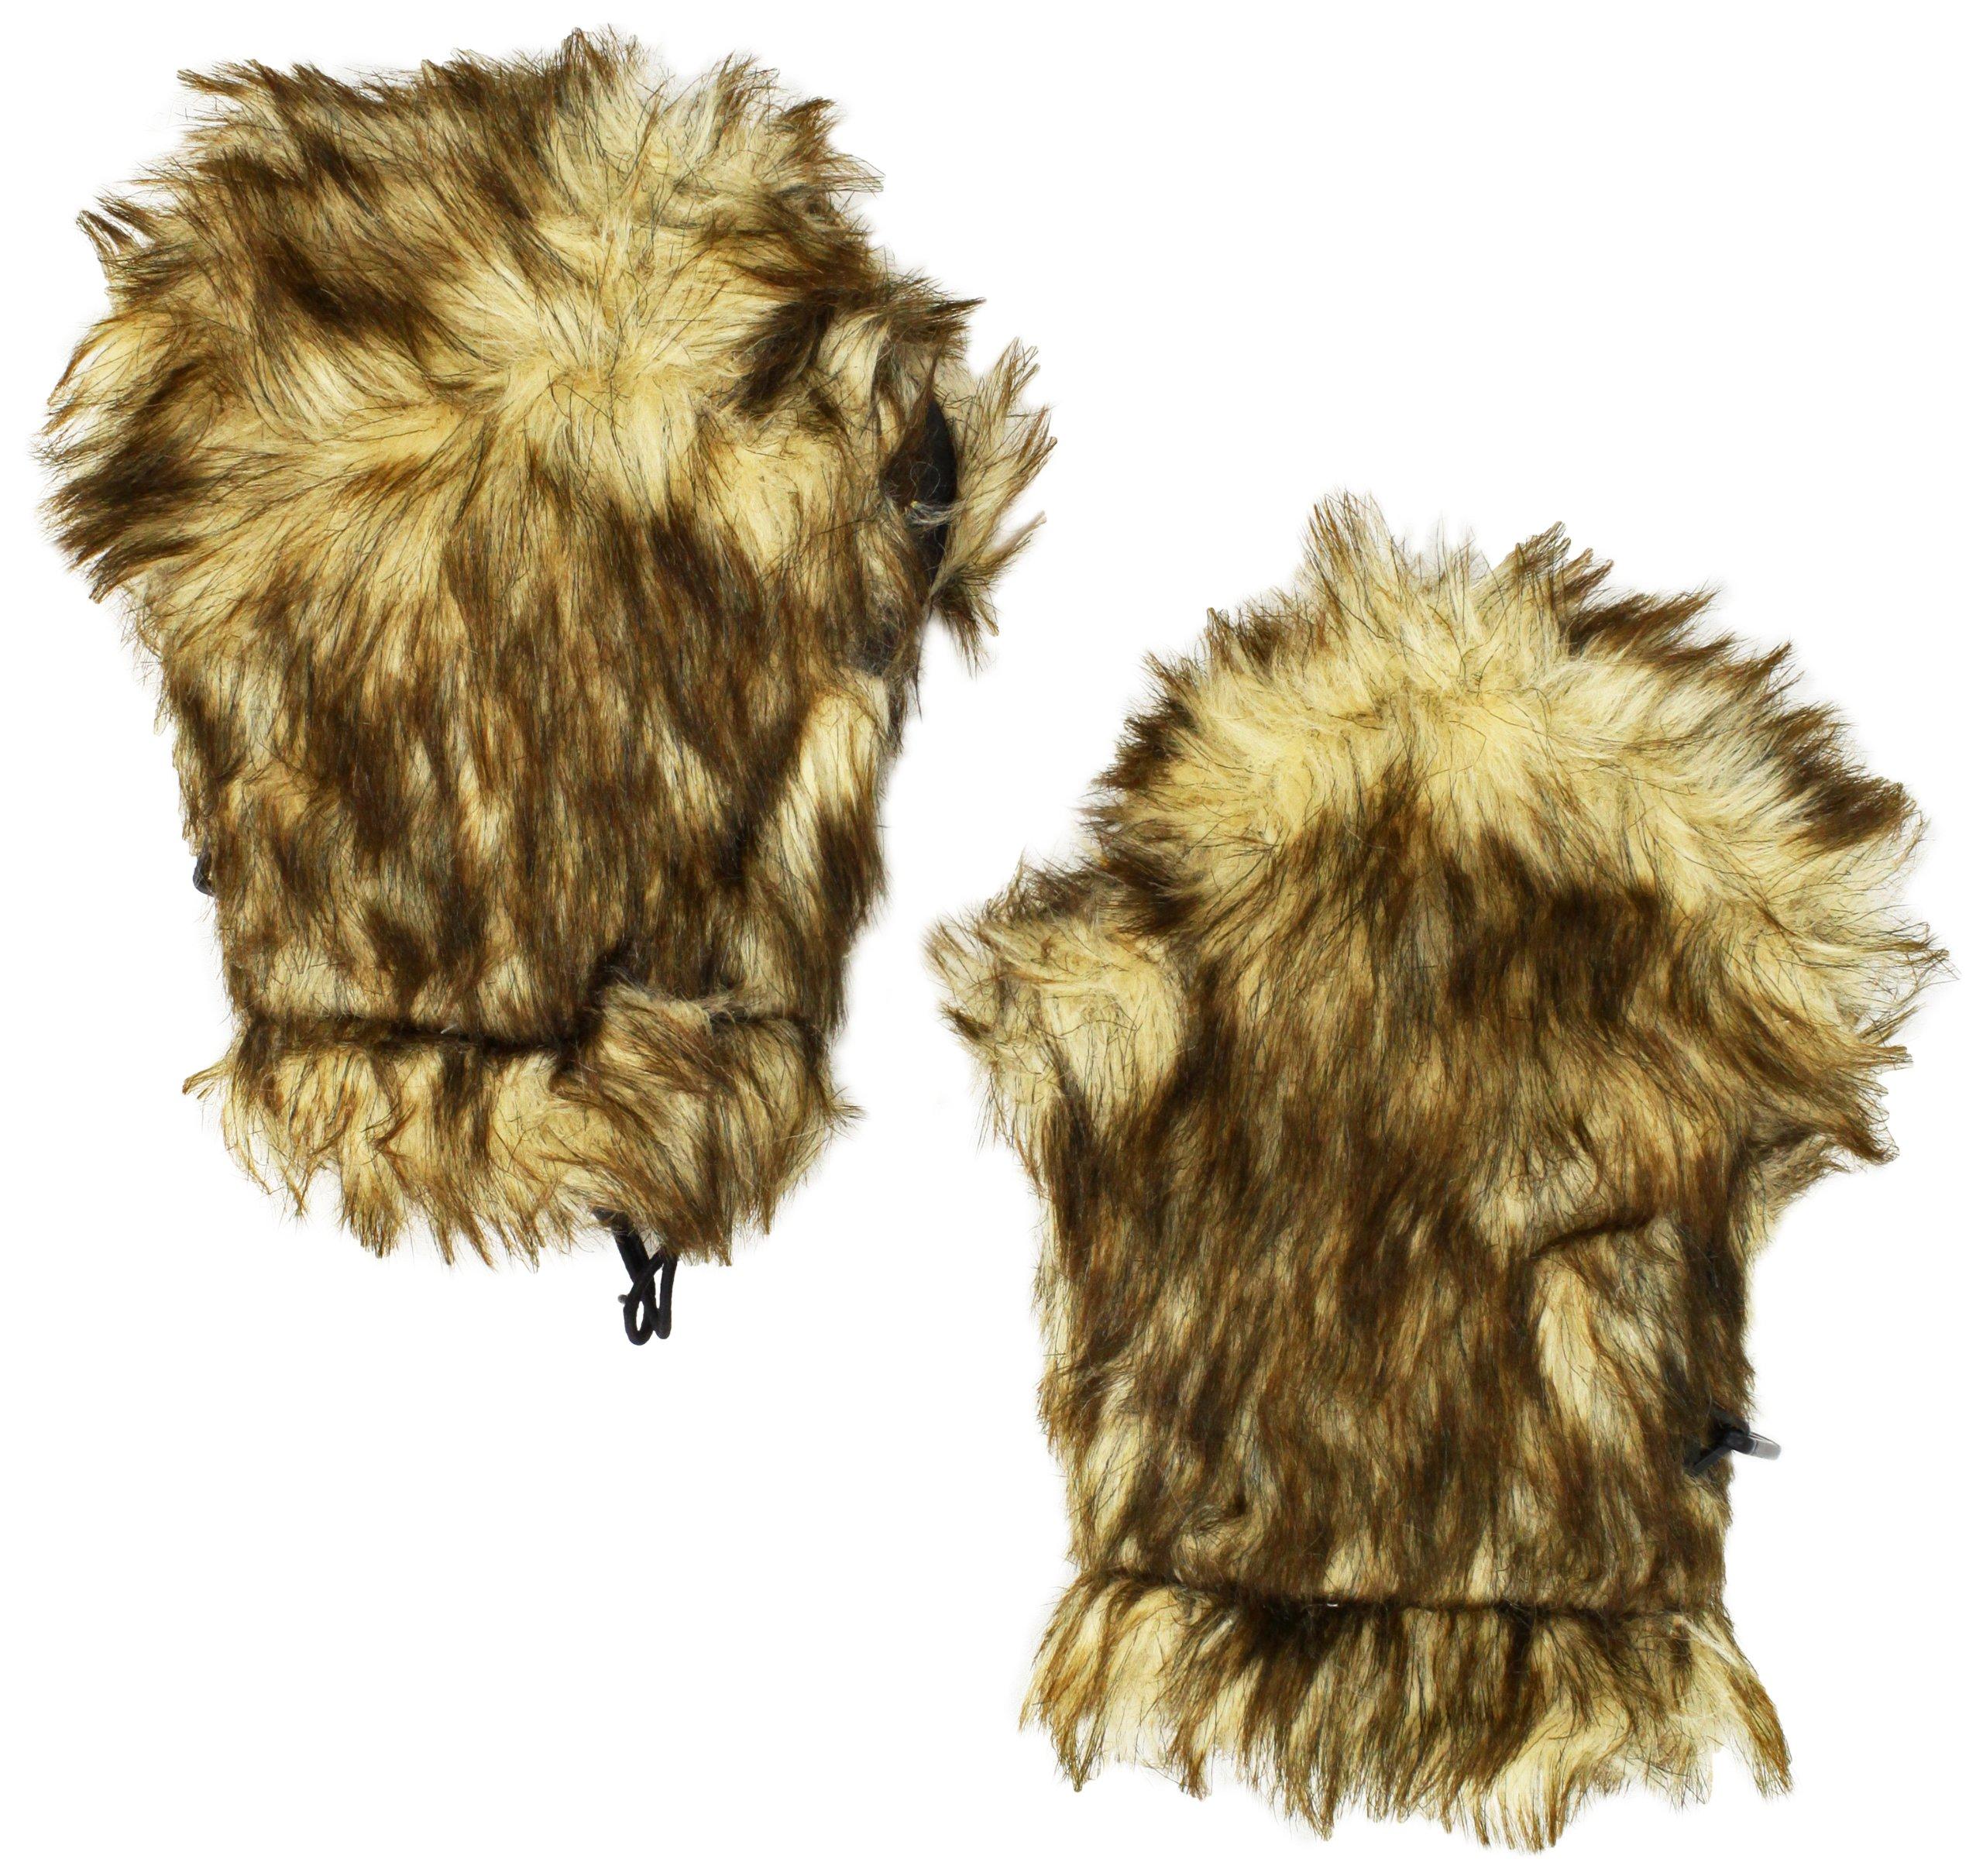 BearHands Little Girls'  Youth Faux Fur Mittens, Beige, 3-7 Years